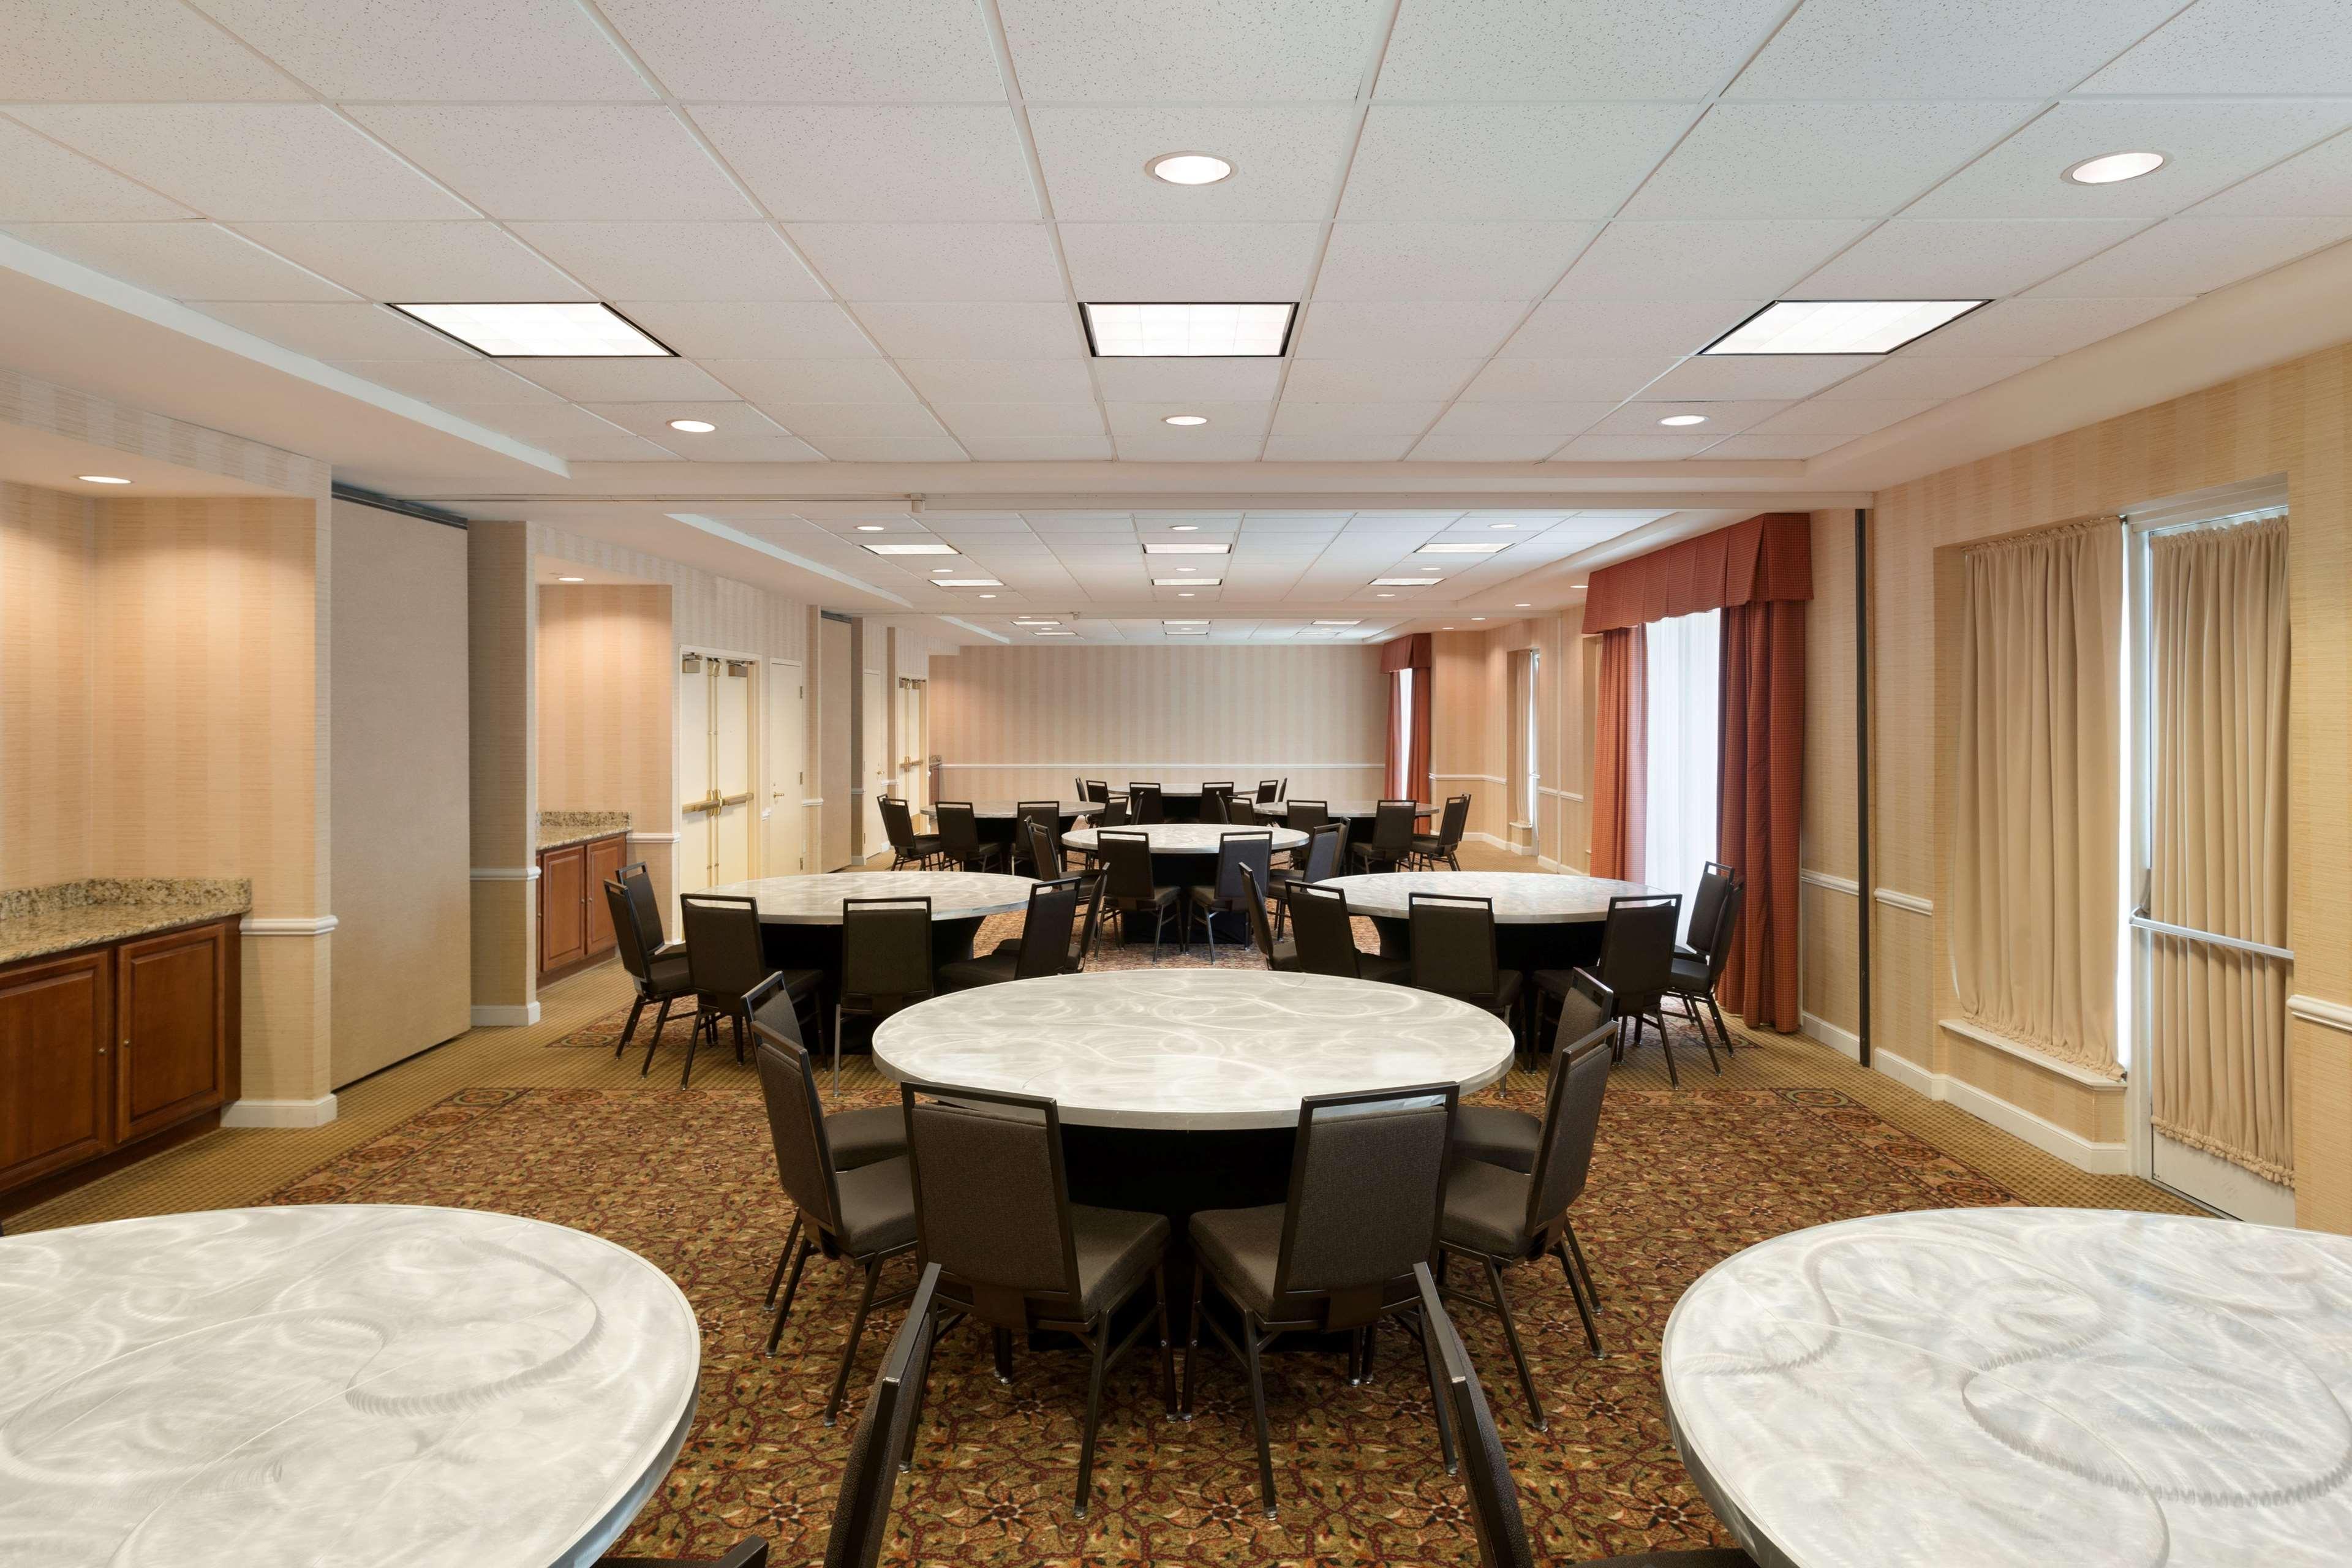 Hilton garden inn chicago oakbrook terrace in oakbrook terrace il 60181 for Hilton garden inn chicago oak brook